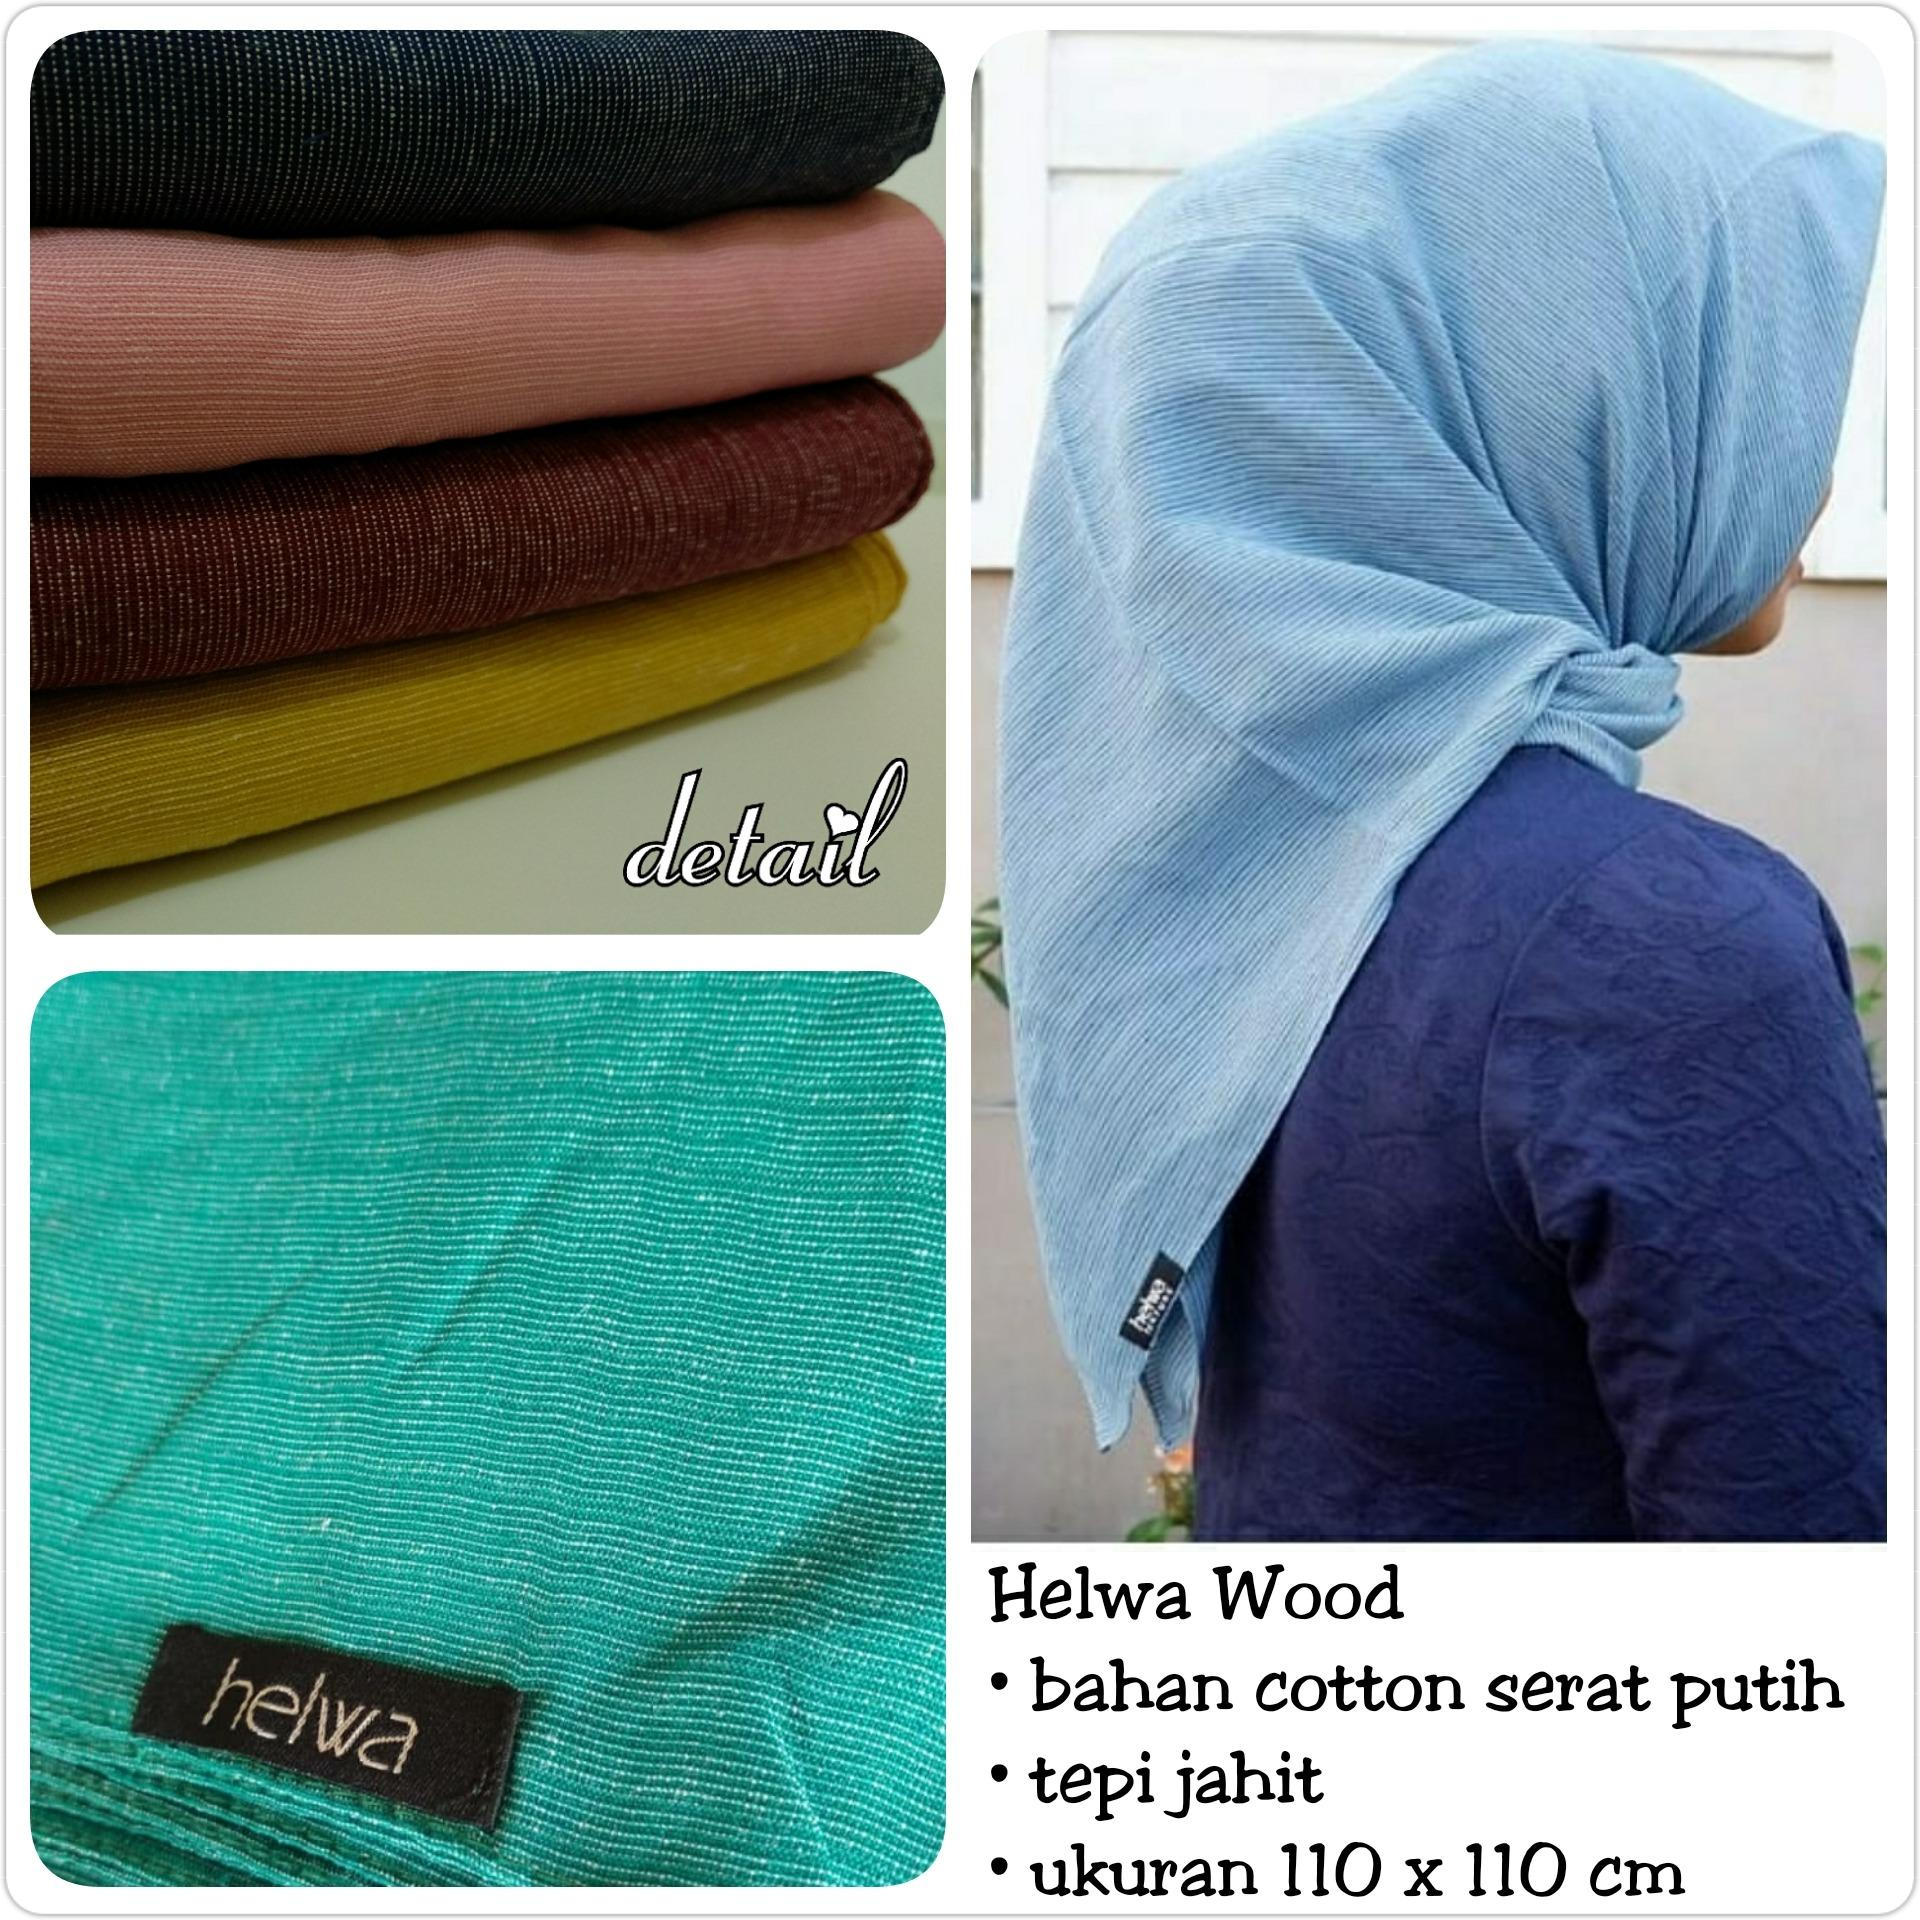 Situs Review Hijab Isi 2 Pcs Jilbab Segiempat Serat Hitam Helwa Texture Ansania Lovilla Shinar Glamour Boleh Pilih Warna Motif